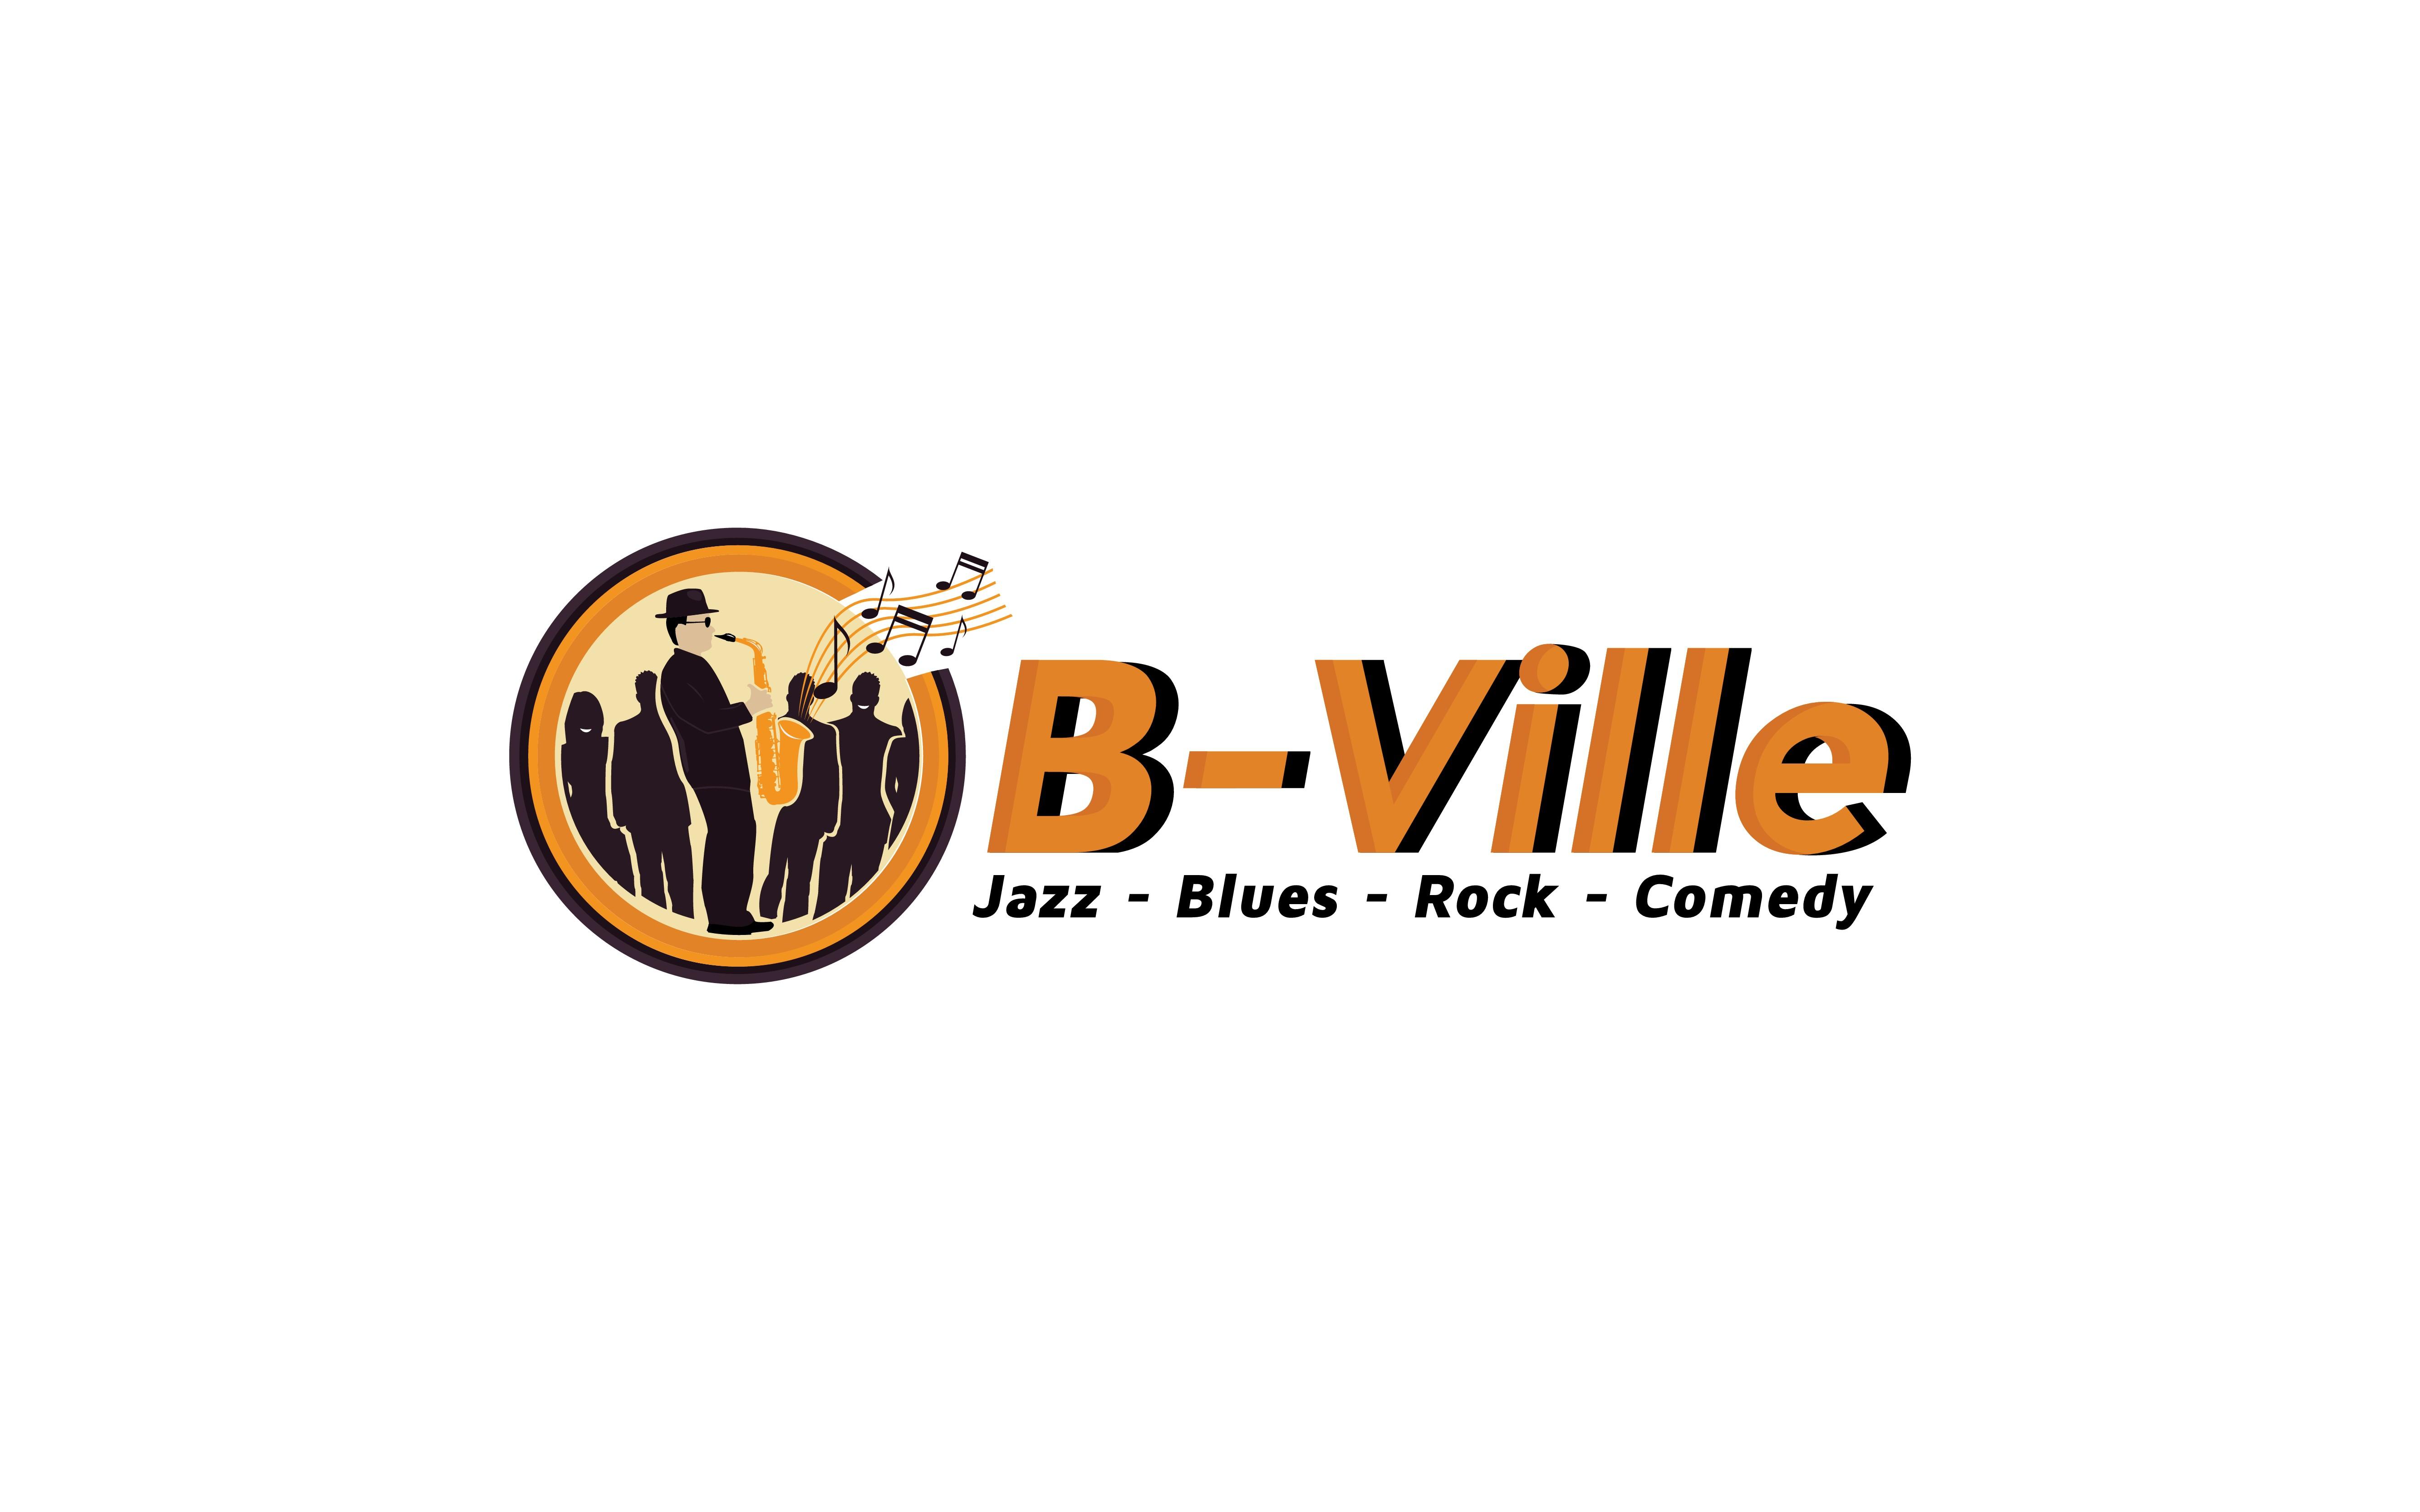 LOGO FOR JAZZ/BLUES NITE CLUB LOCATED IN THE CATSKILLS NY